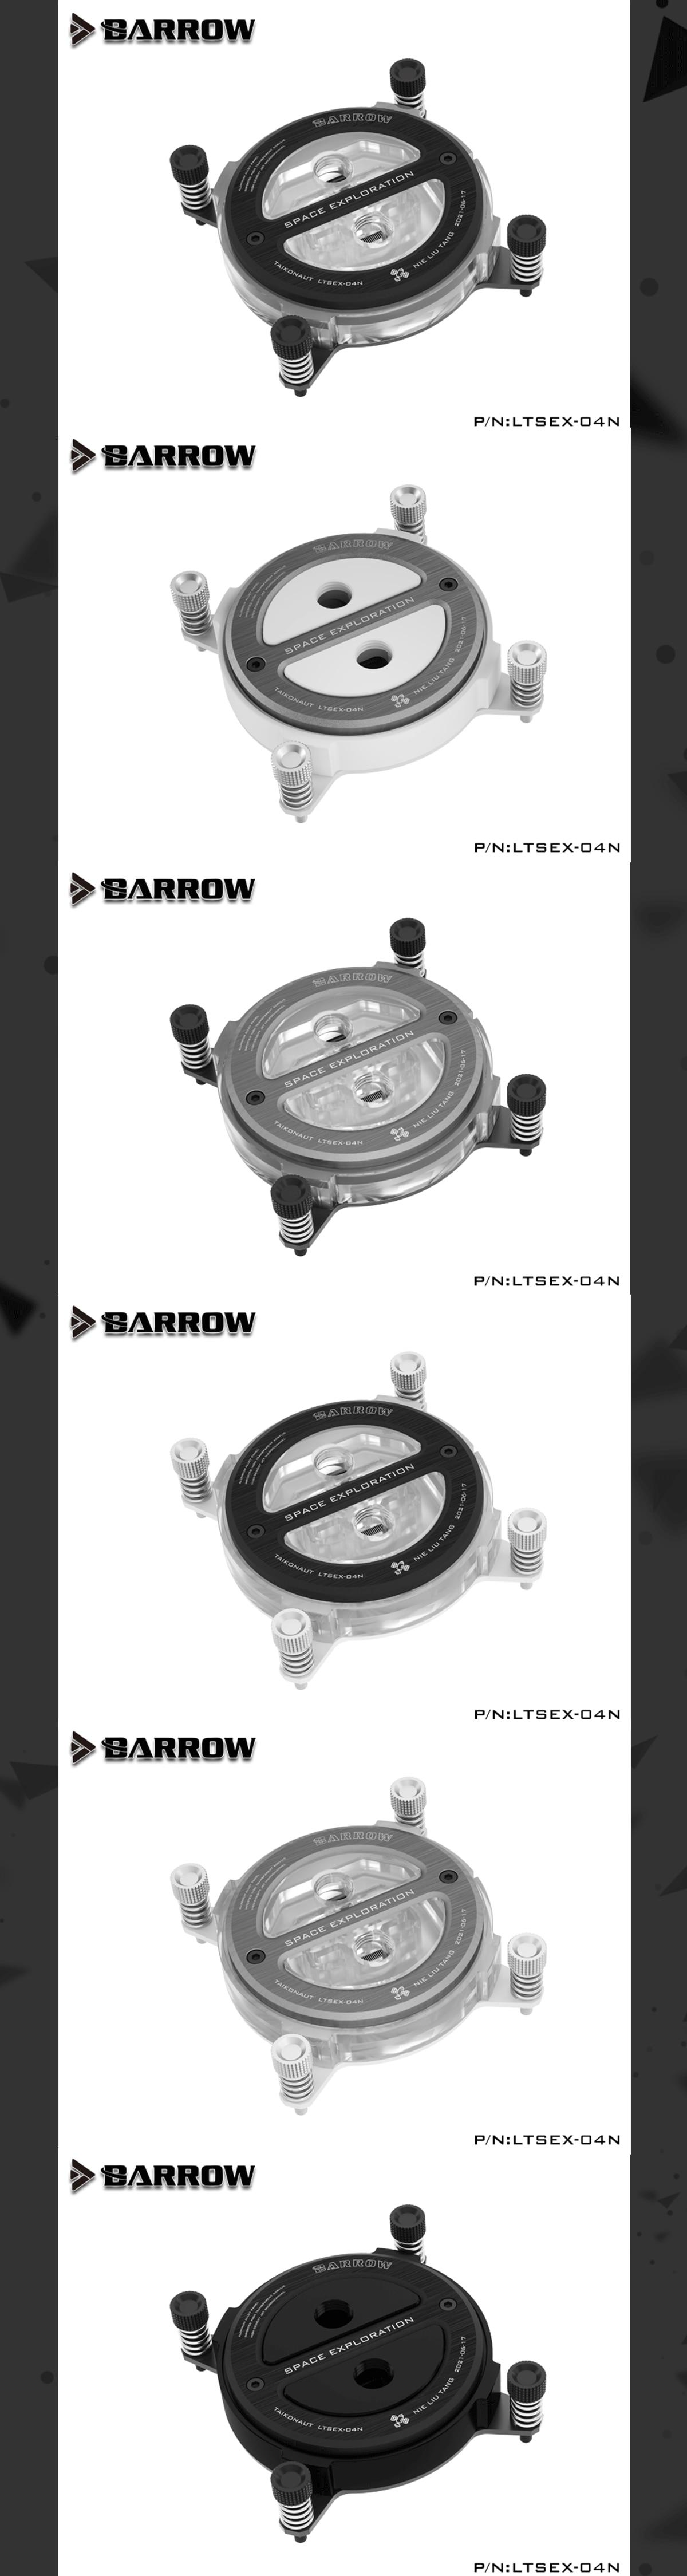 Barrow Astronaut Series CPU Water Block For Intel AMD , Acrylic/POM Liquid Cooling System Micro Waterway LTSE-04N LTSEA-04N LTSEX-04N